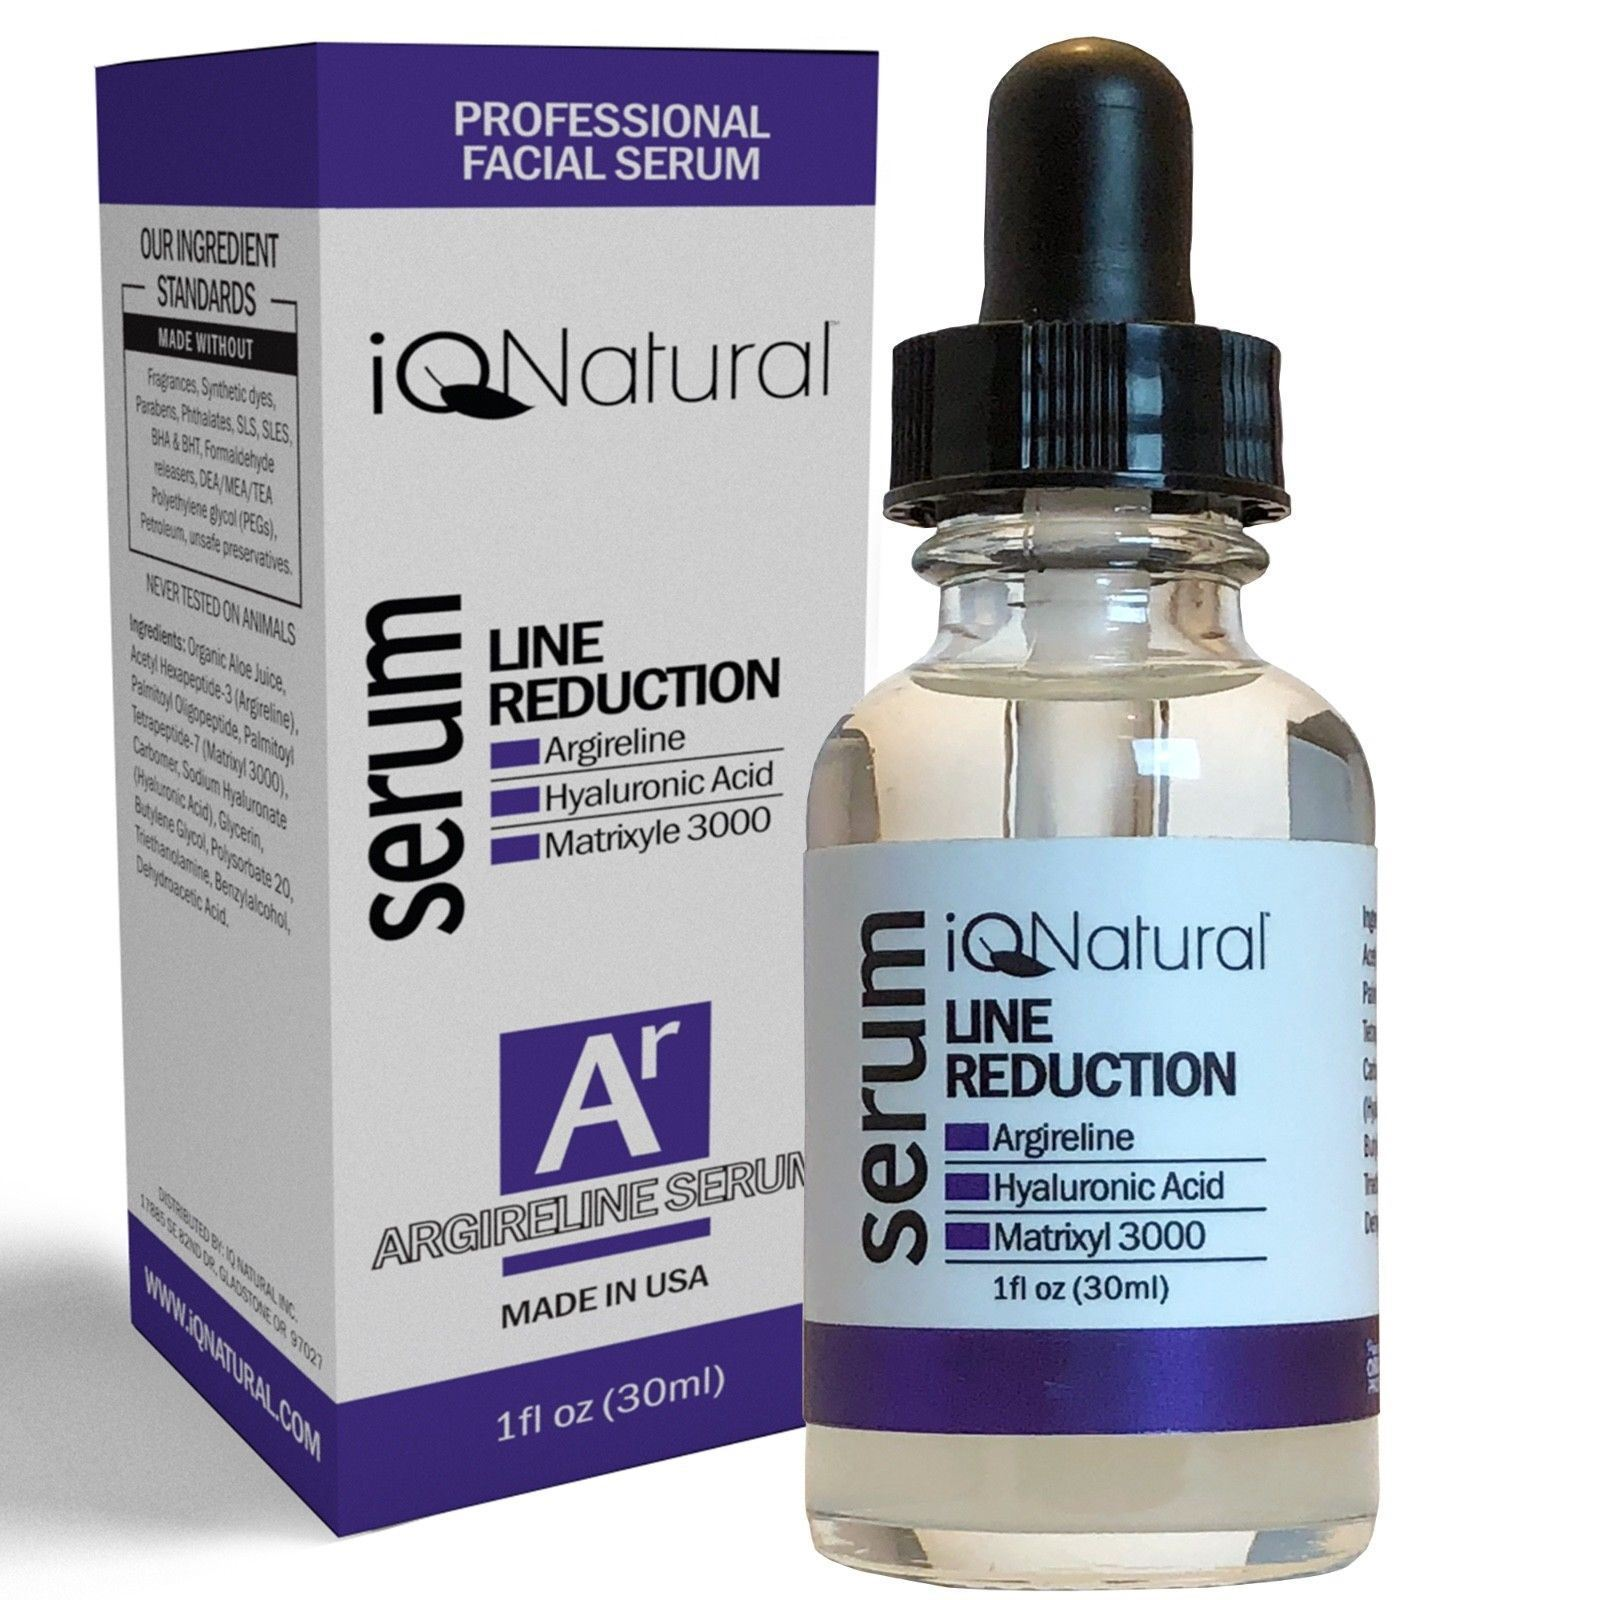 Wrinkle Firming Peptide Facial Serum / w/ Argireline, Matrixyl & Hyaluronic Acid 3